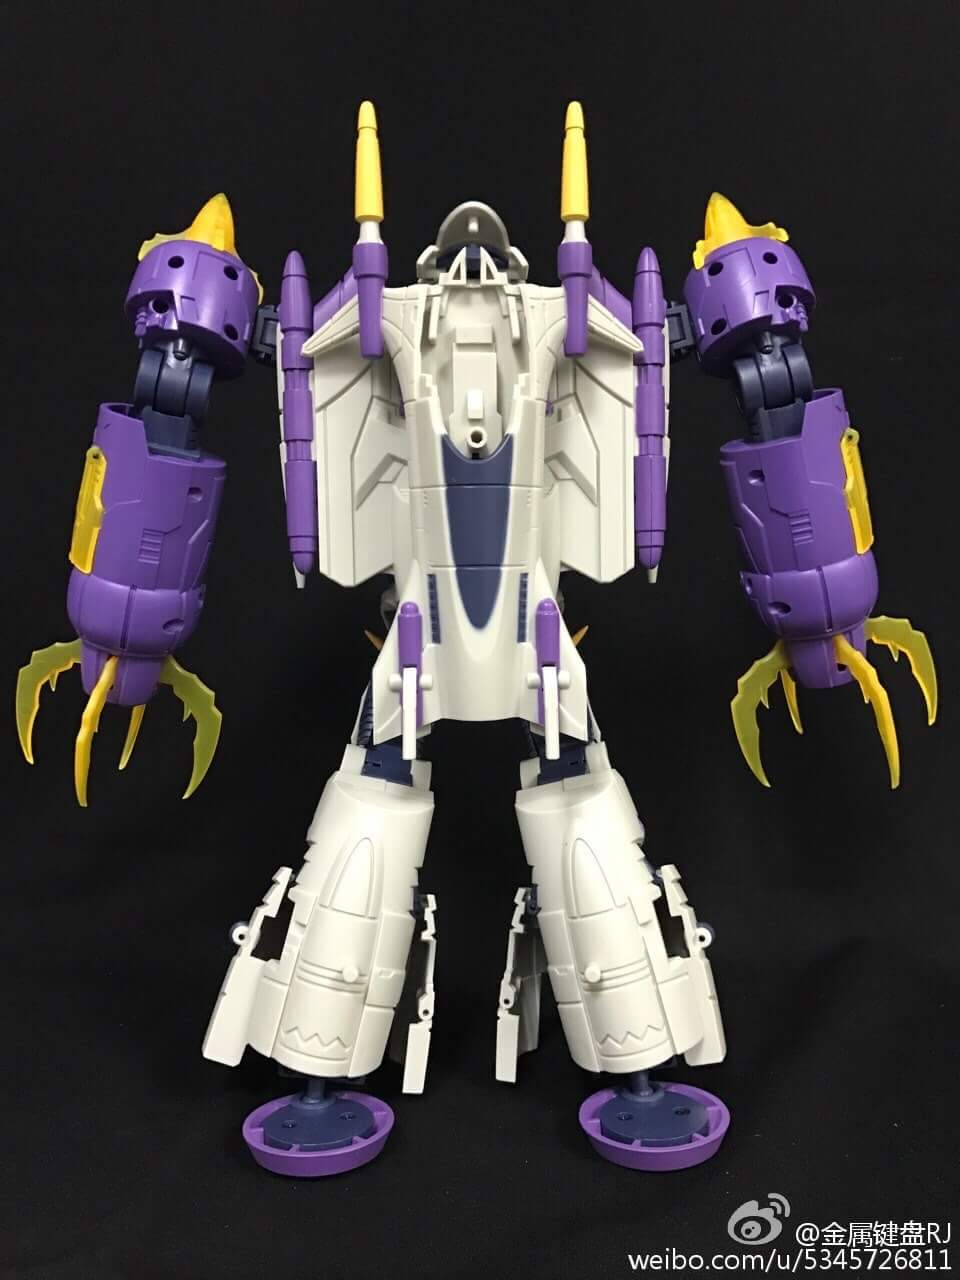 [Garatron] Produit Tiers - Gand of Devils G.O.D-01 Thunderstorm - aka Thunderwing des BD TF d'IDW ZeQn29DO